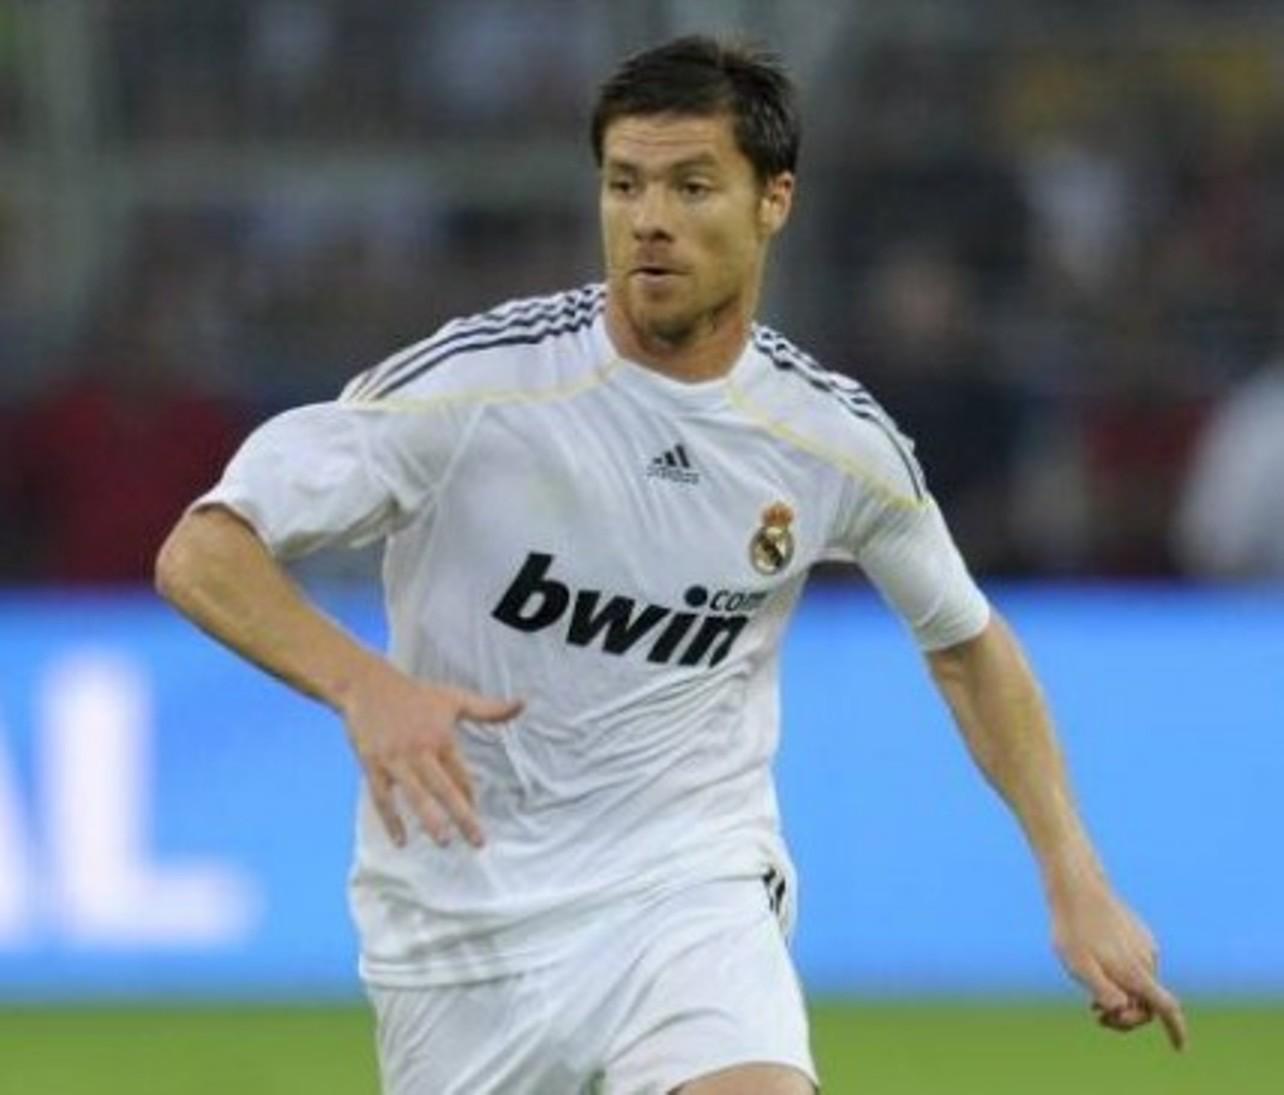 Xabi Alonso Real Madrid HD Wallpapers 2013 ImageBankbiz 1284x1095